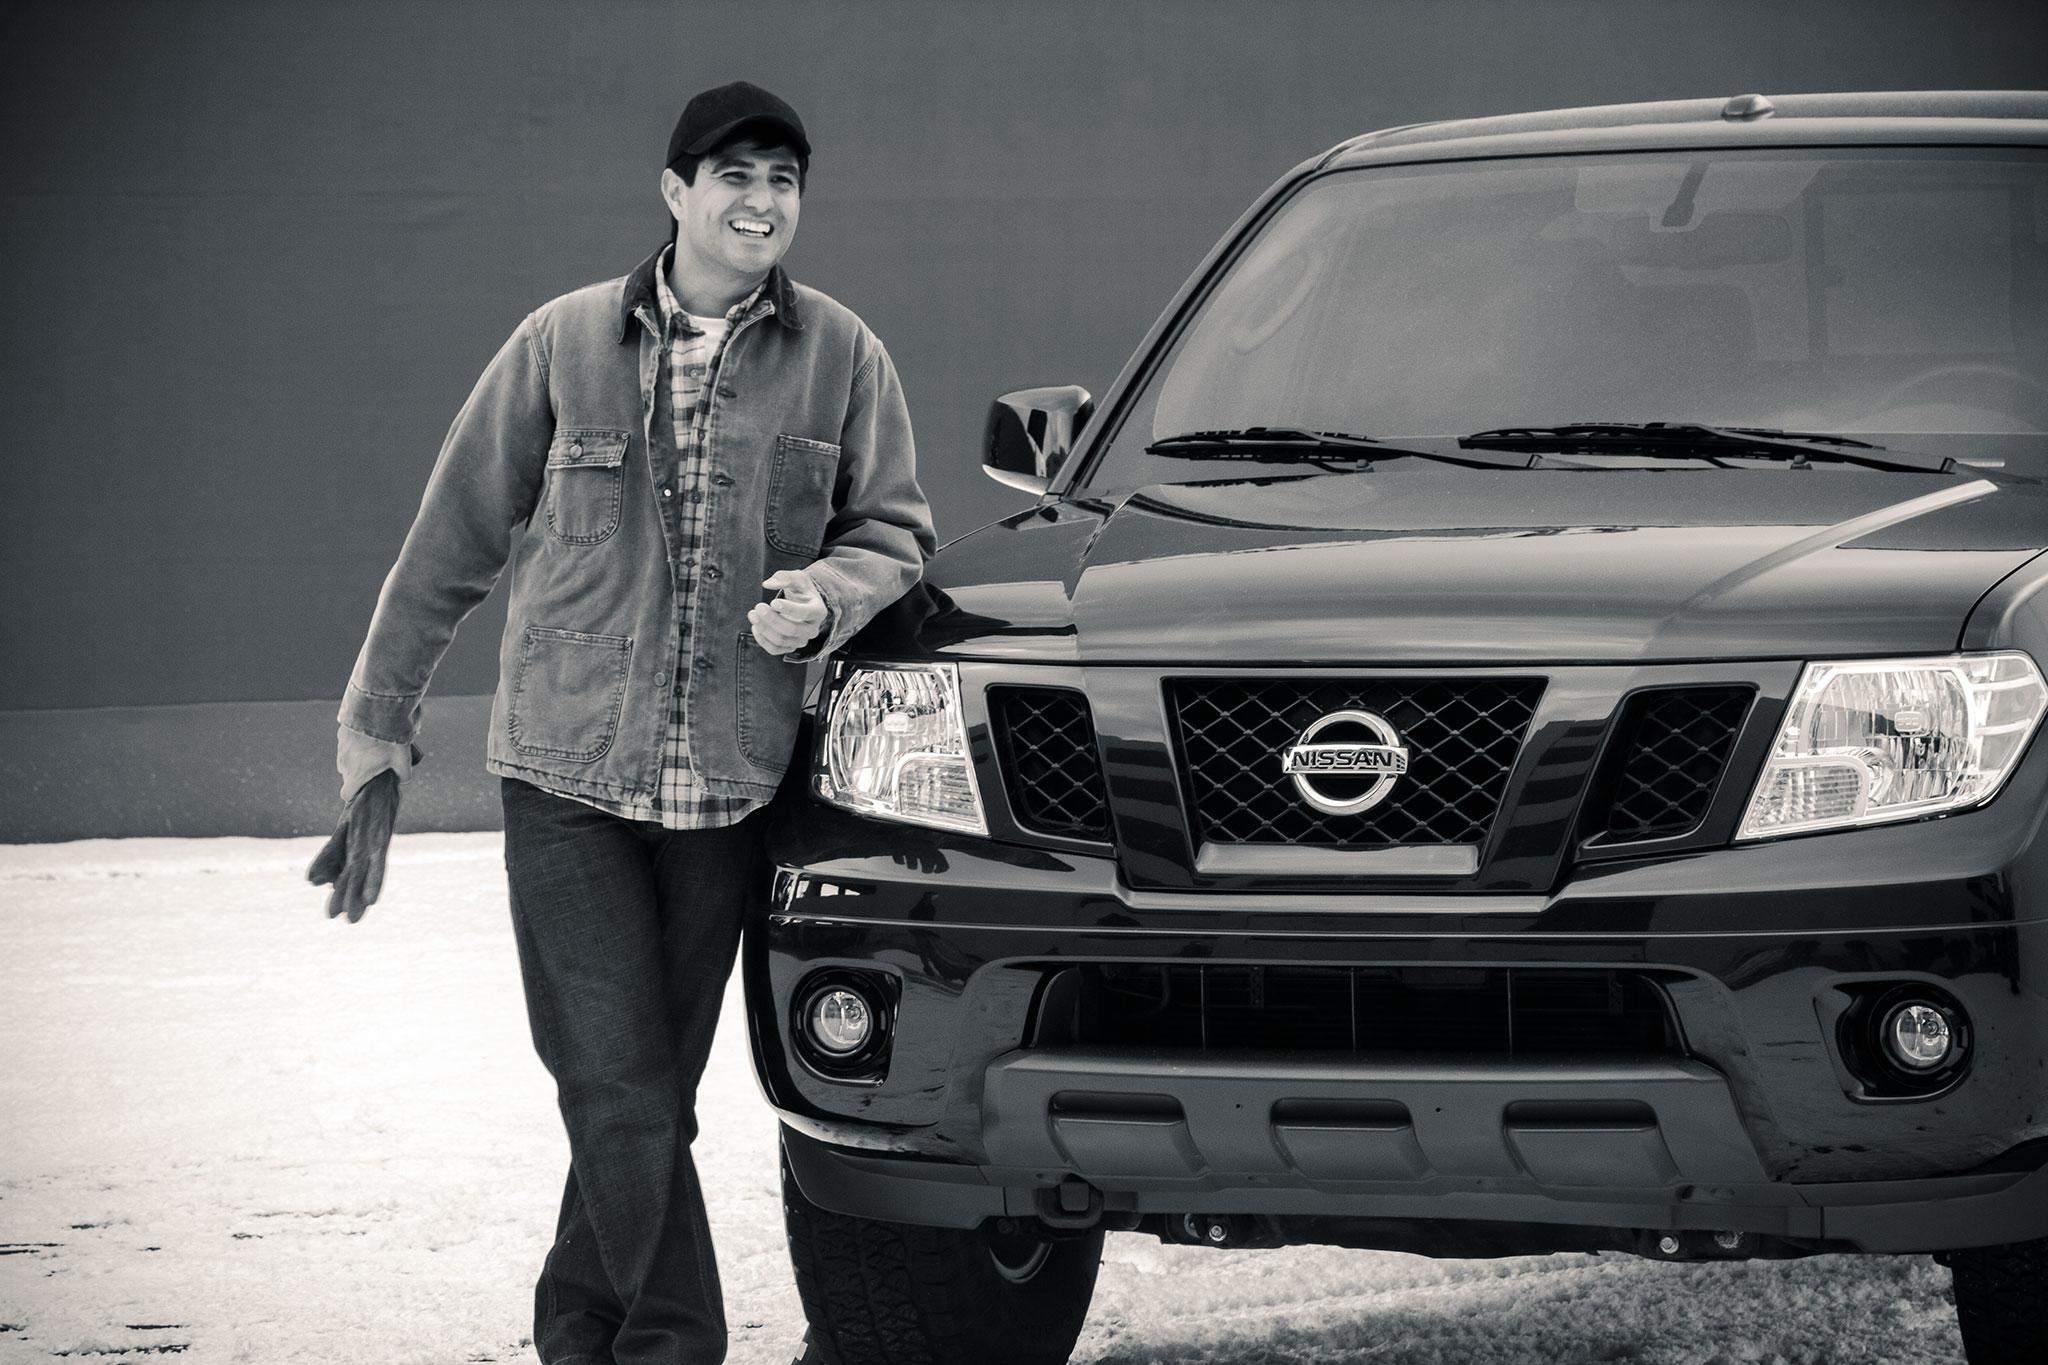 """HOLIDAYS"" - NISSAN  Nissan / Zimmerman / Motion Theory Dir: Brent Jones DP: Amir Mokri"